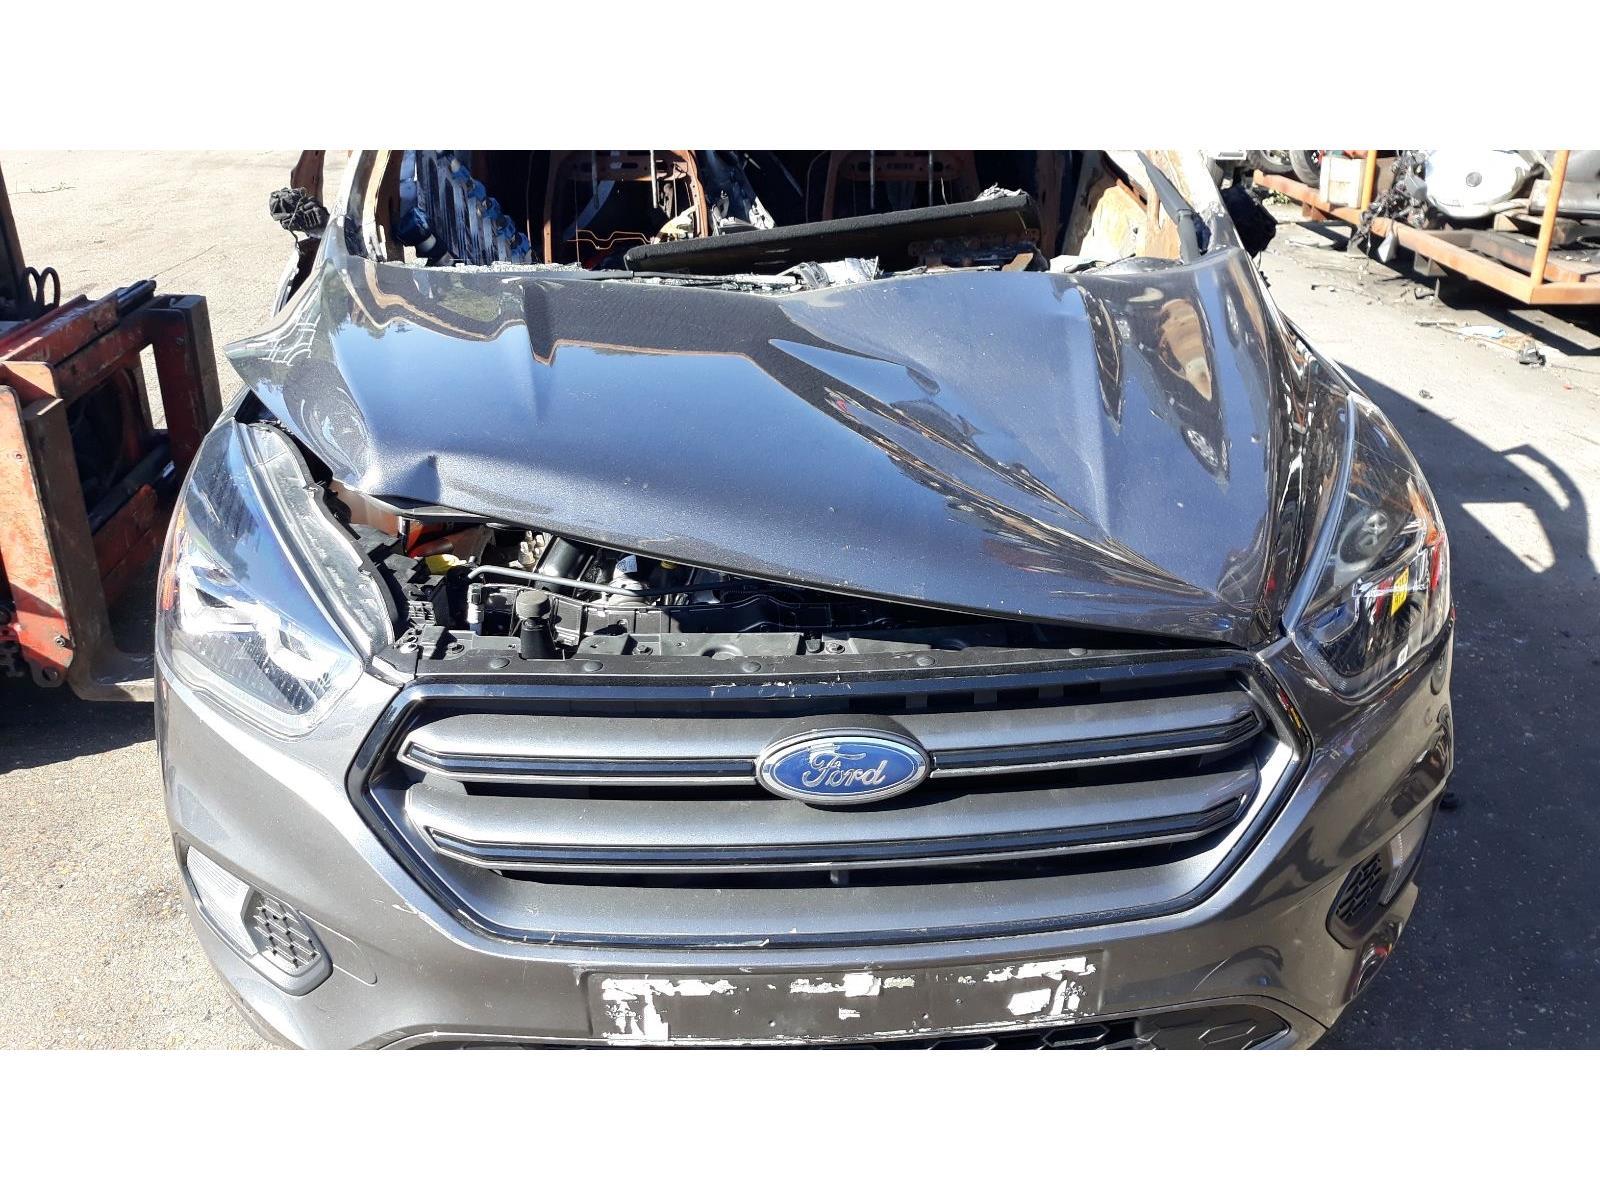 2017 Ford Kuga 2016 On St Line Tdci 15l Manual Diesel Grey Car Fuse Box 4000 Parts Matching